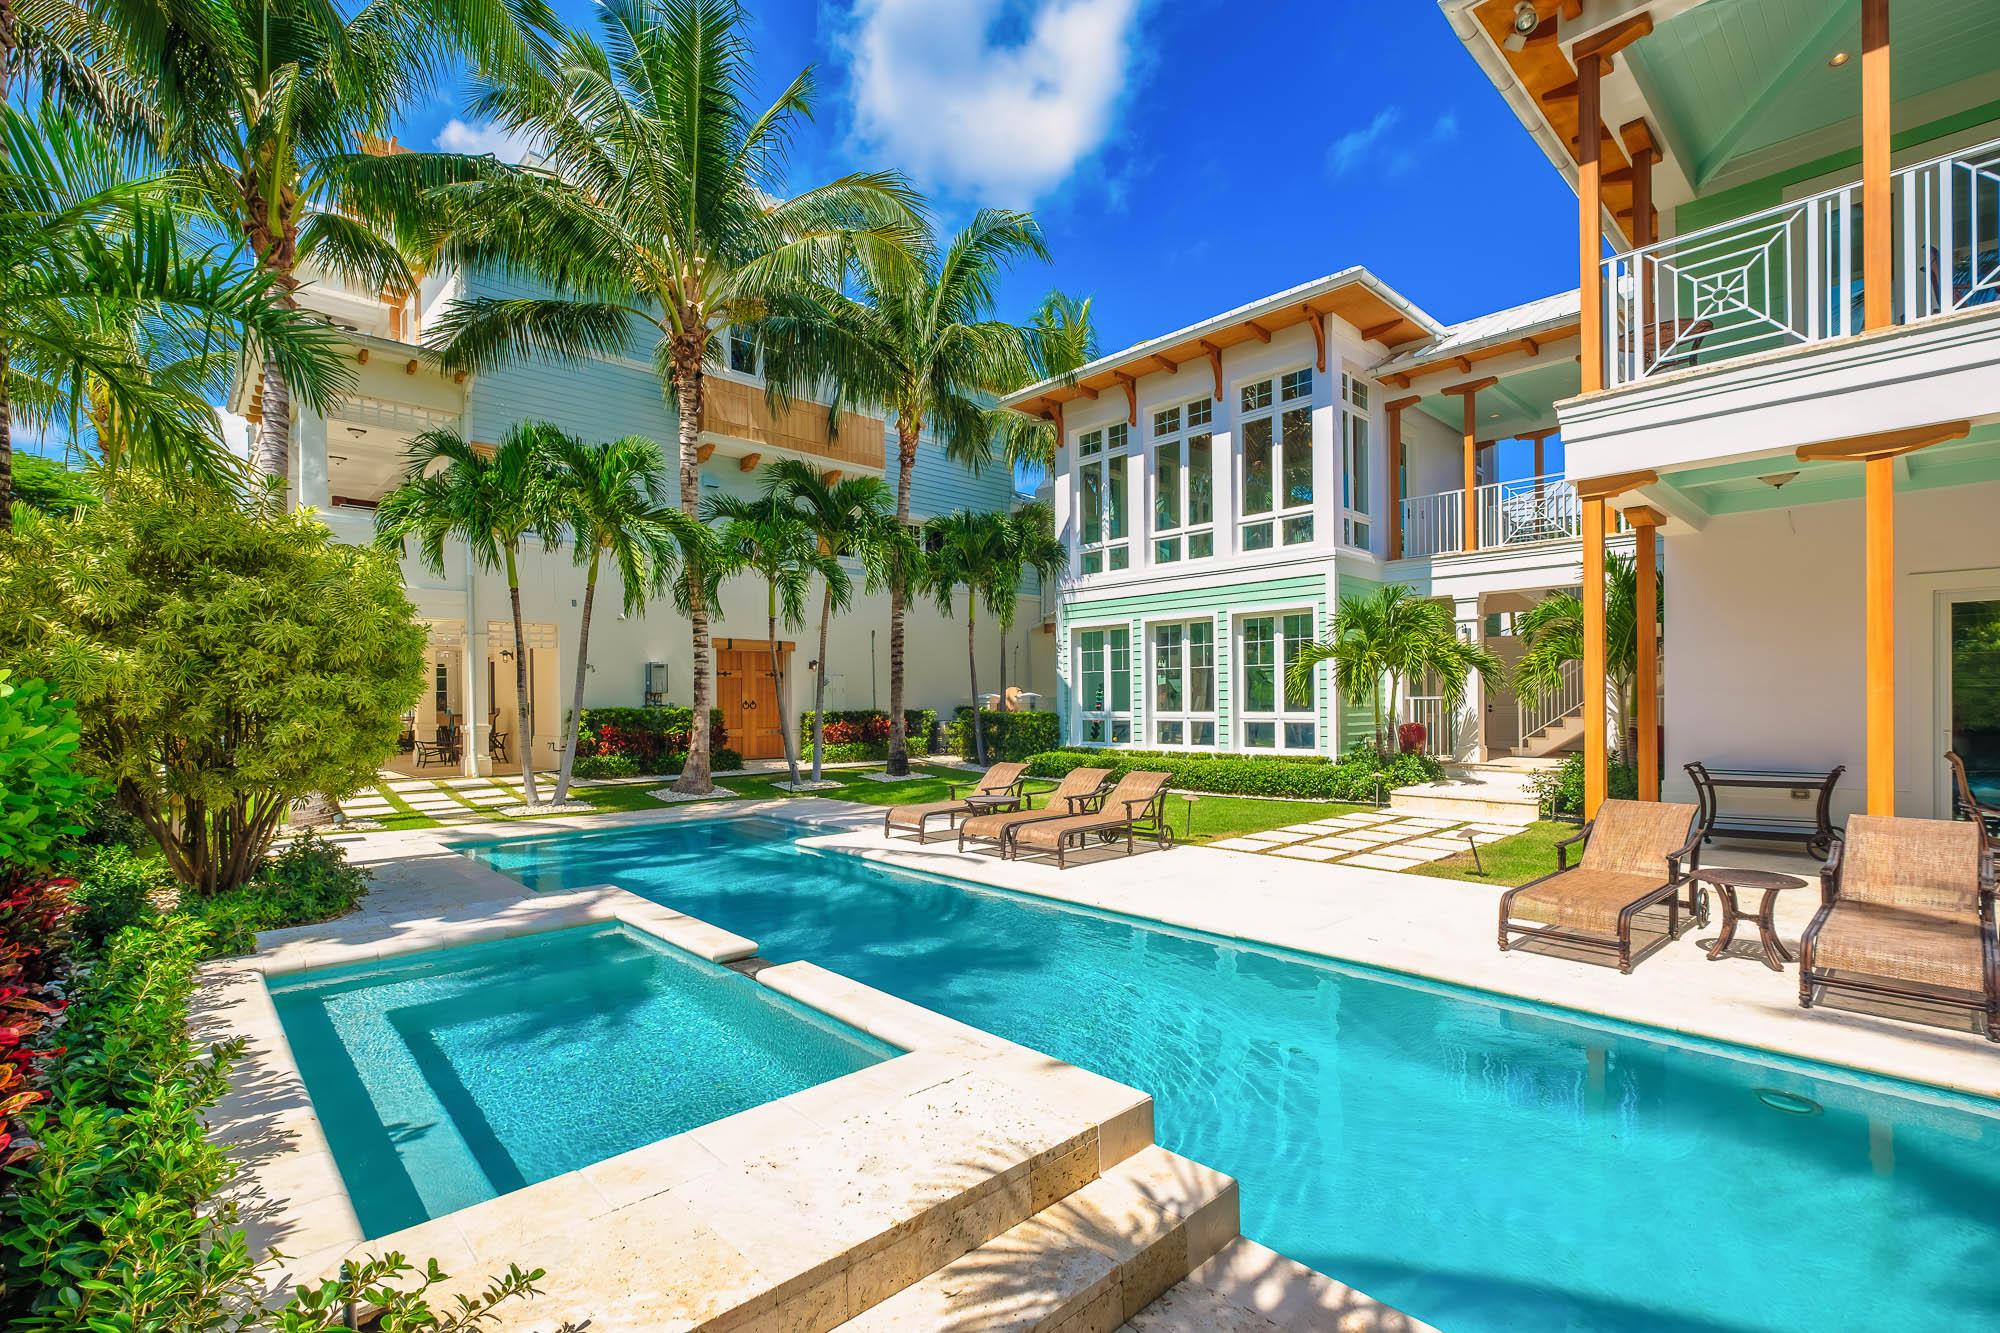 950 Lago Mar Ln, Boca Raton, FL, 33431